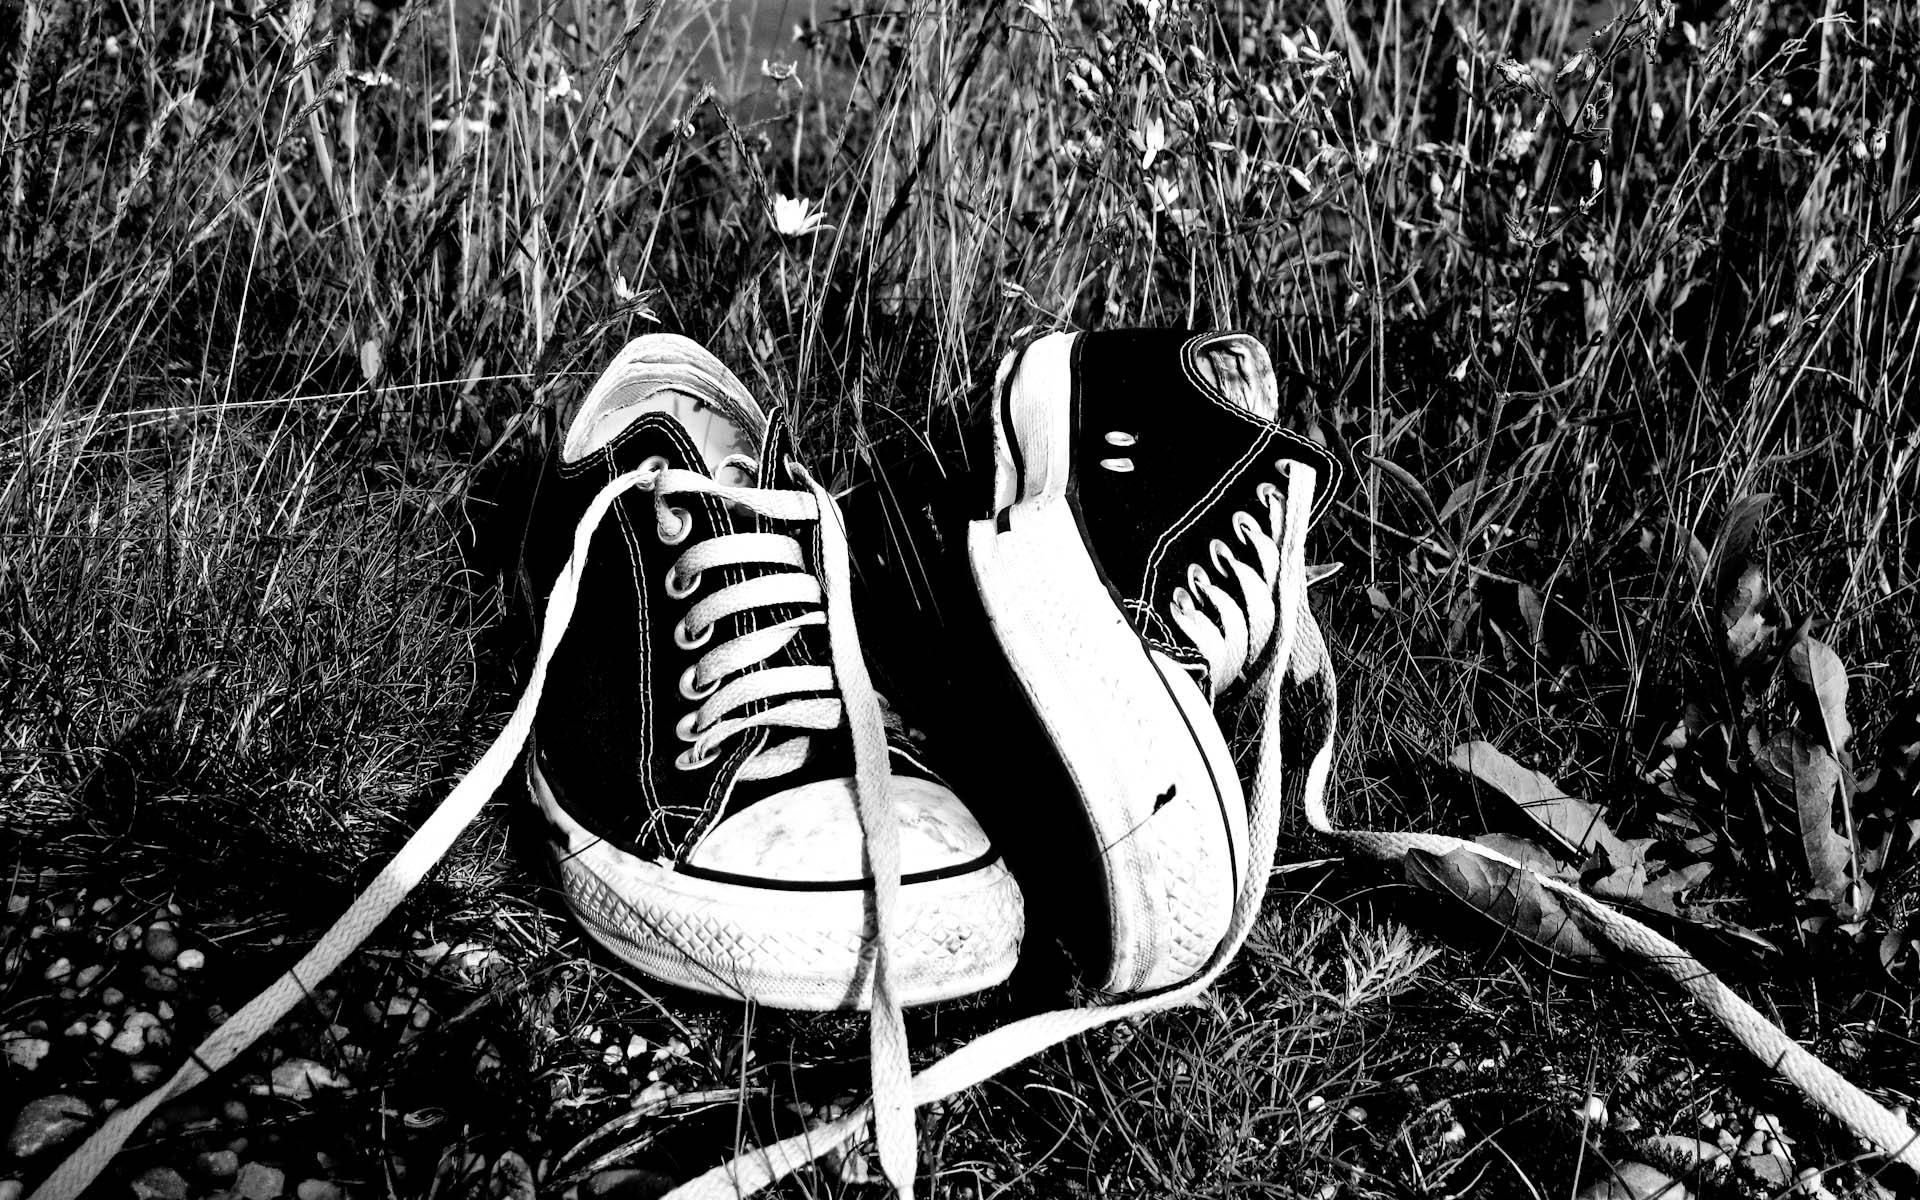 <b>Converse</b> in <b>Black</b> and <b>White</b> by Corrineak on DeviantArt